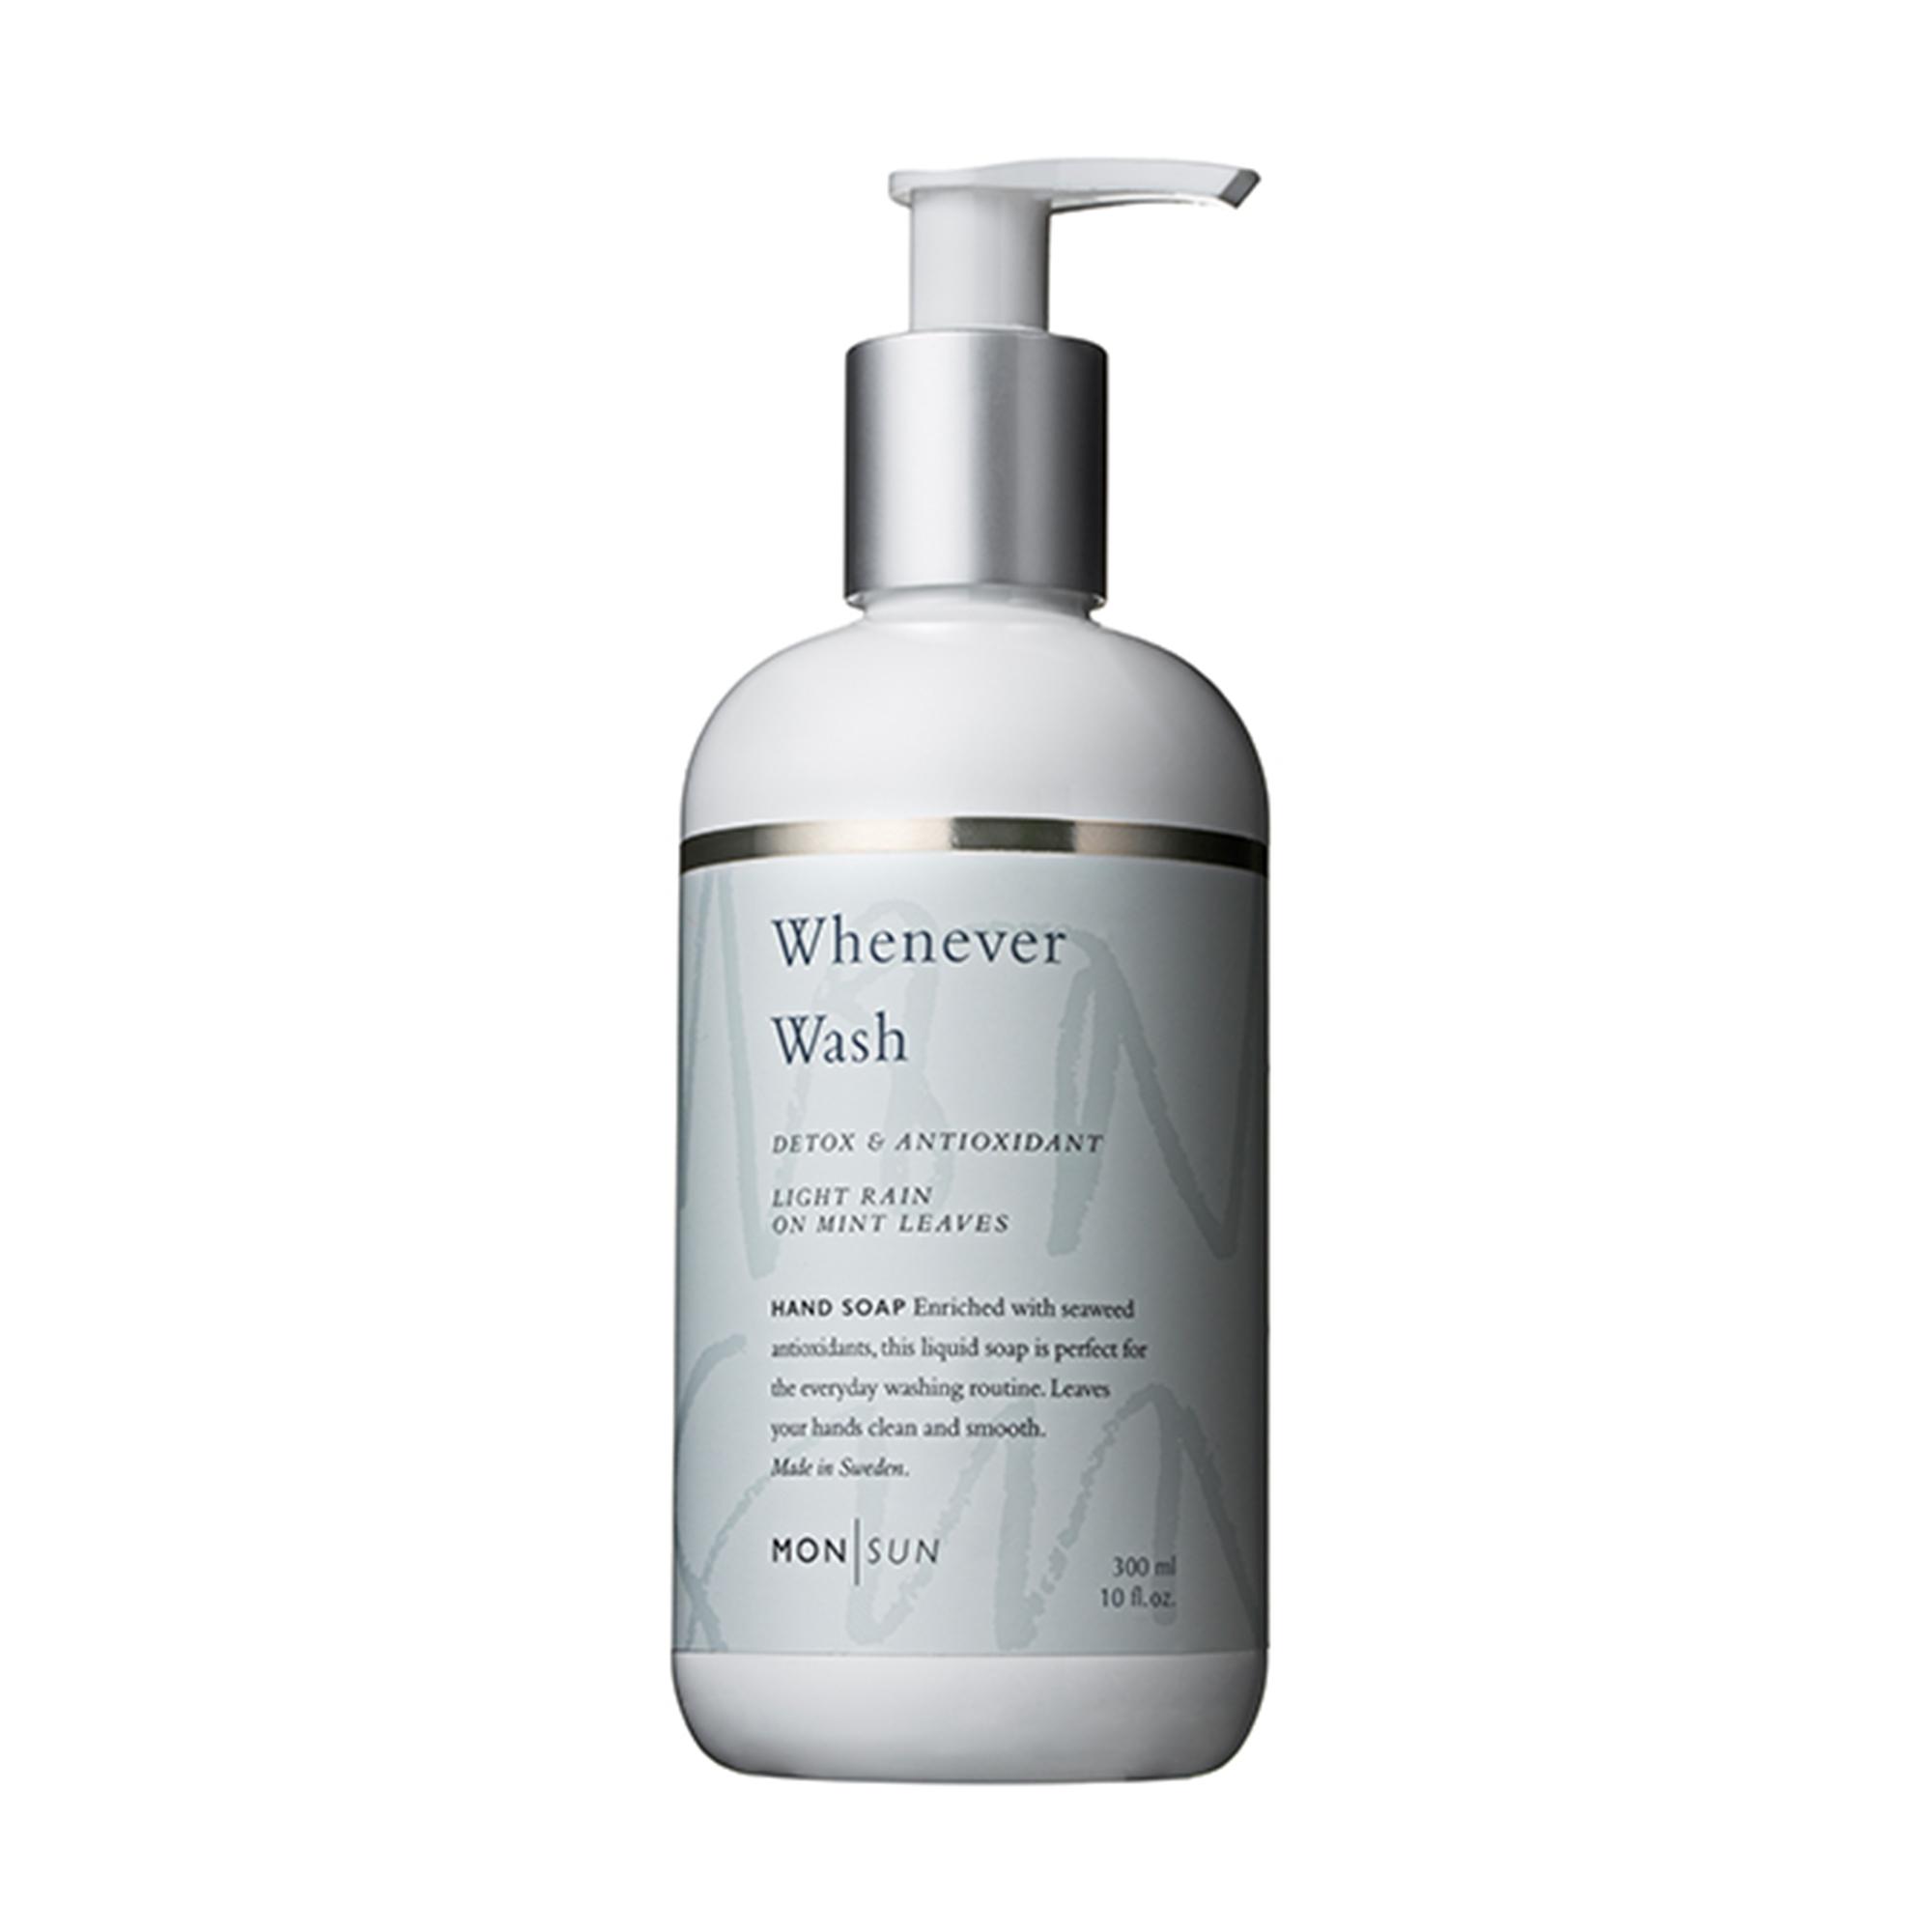 Whenever Wash Detox & Antioxidant Hand Soap 300ml